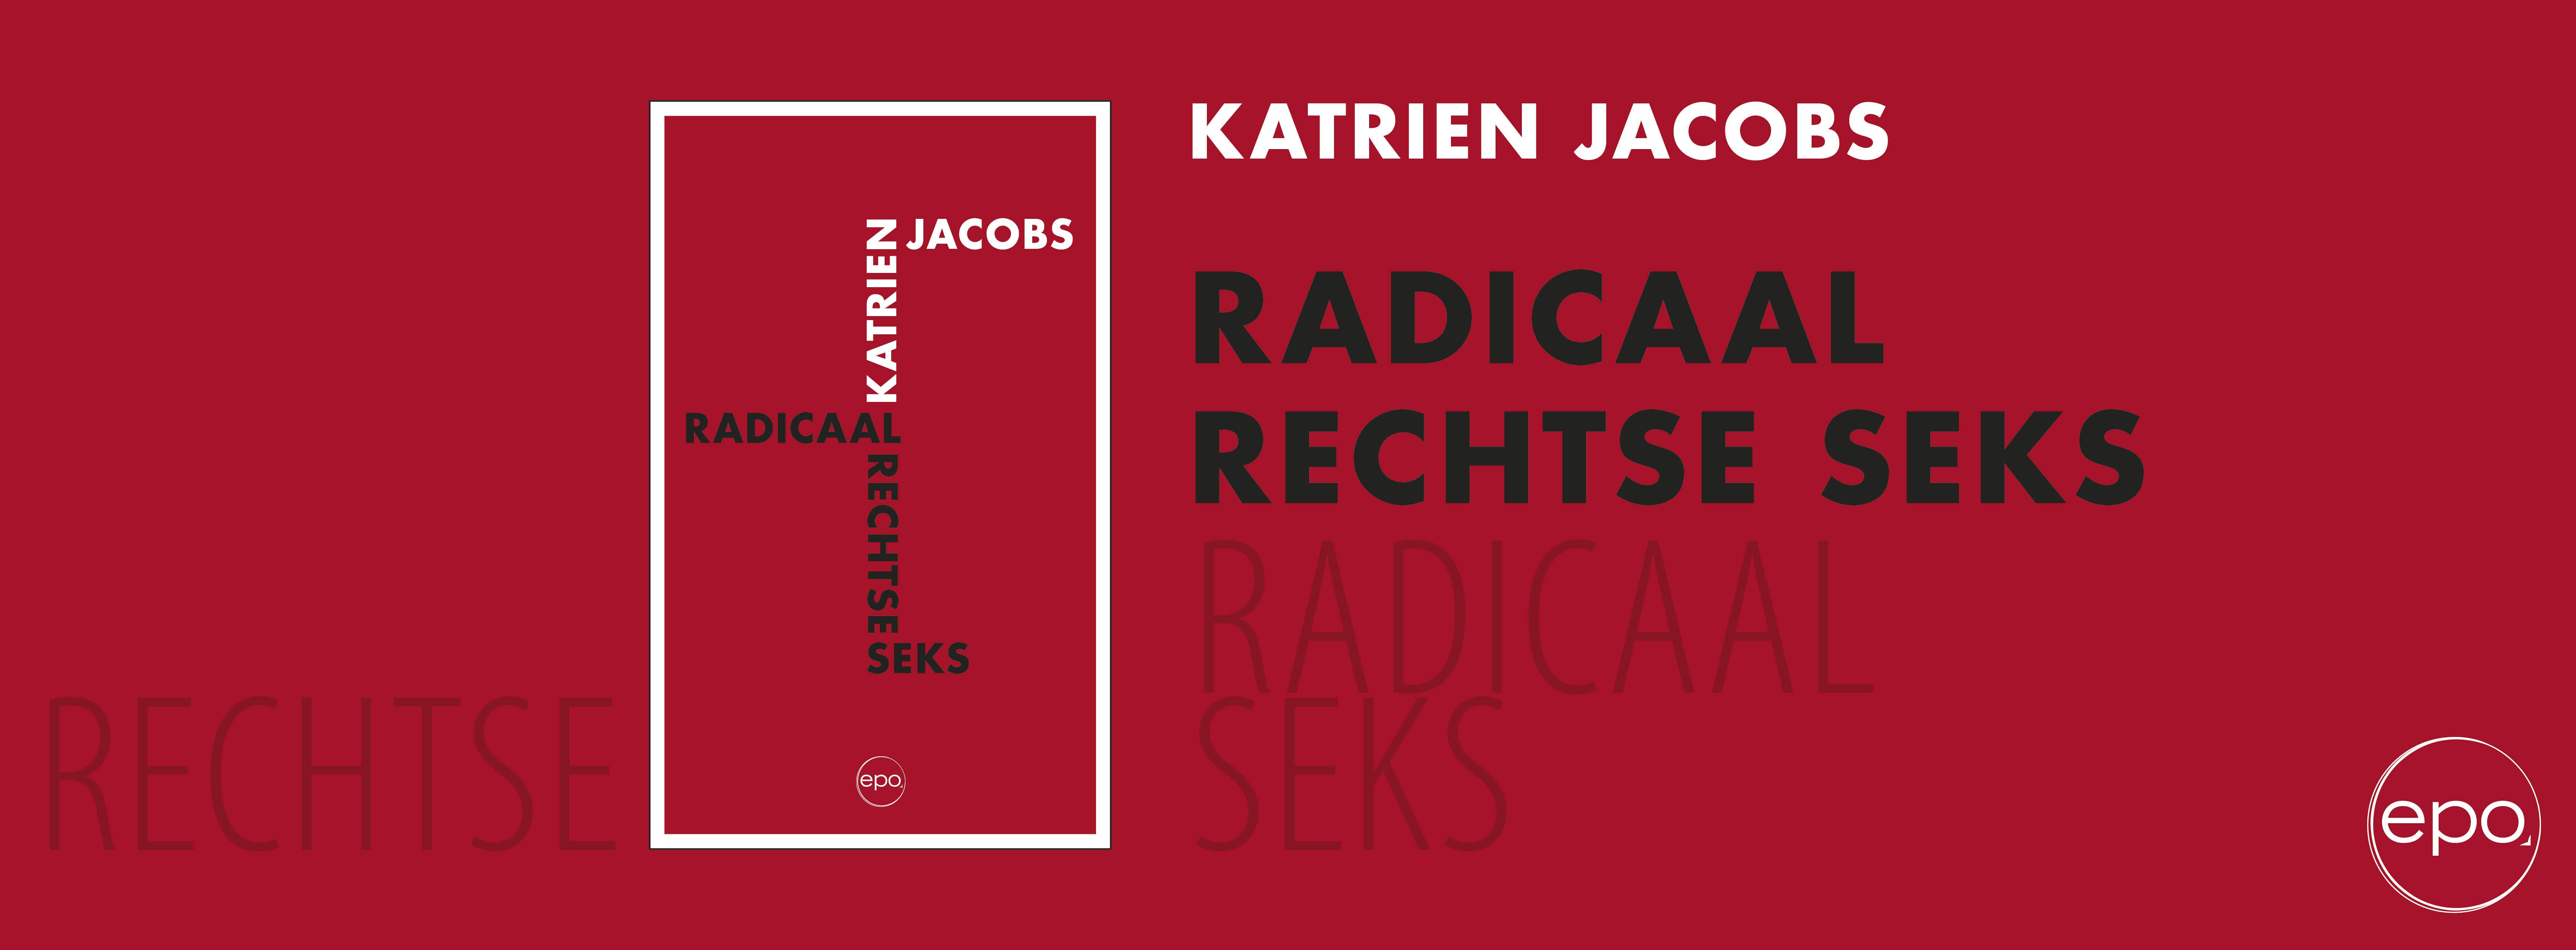 Radicaal-rechtse seks FB banner 851px 314px